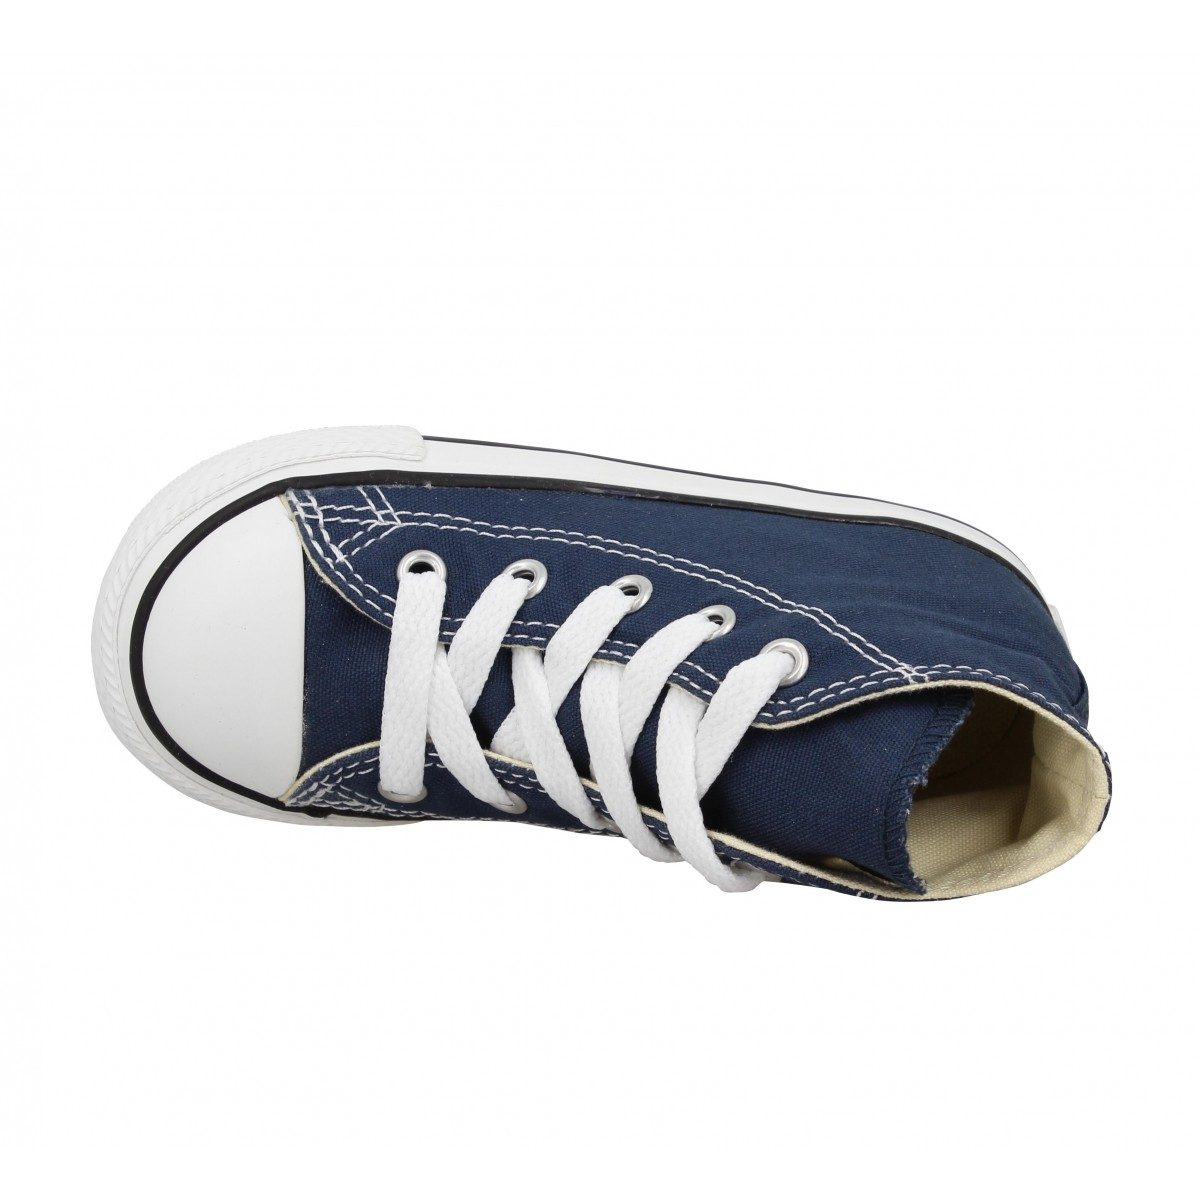 Converse 15860 Toile Enfant Marine Fanny Chaussures